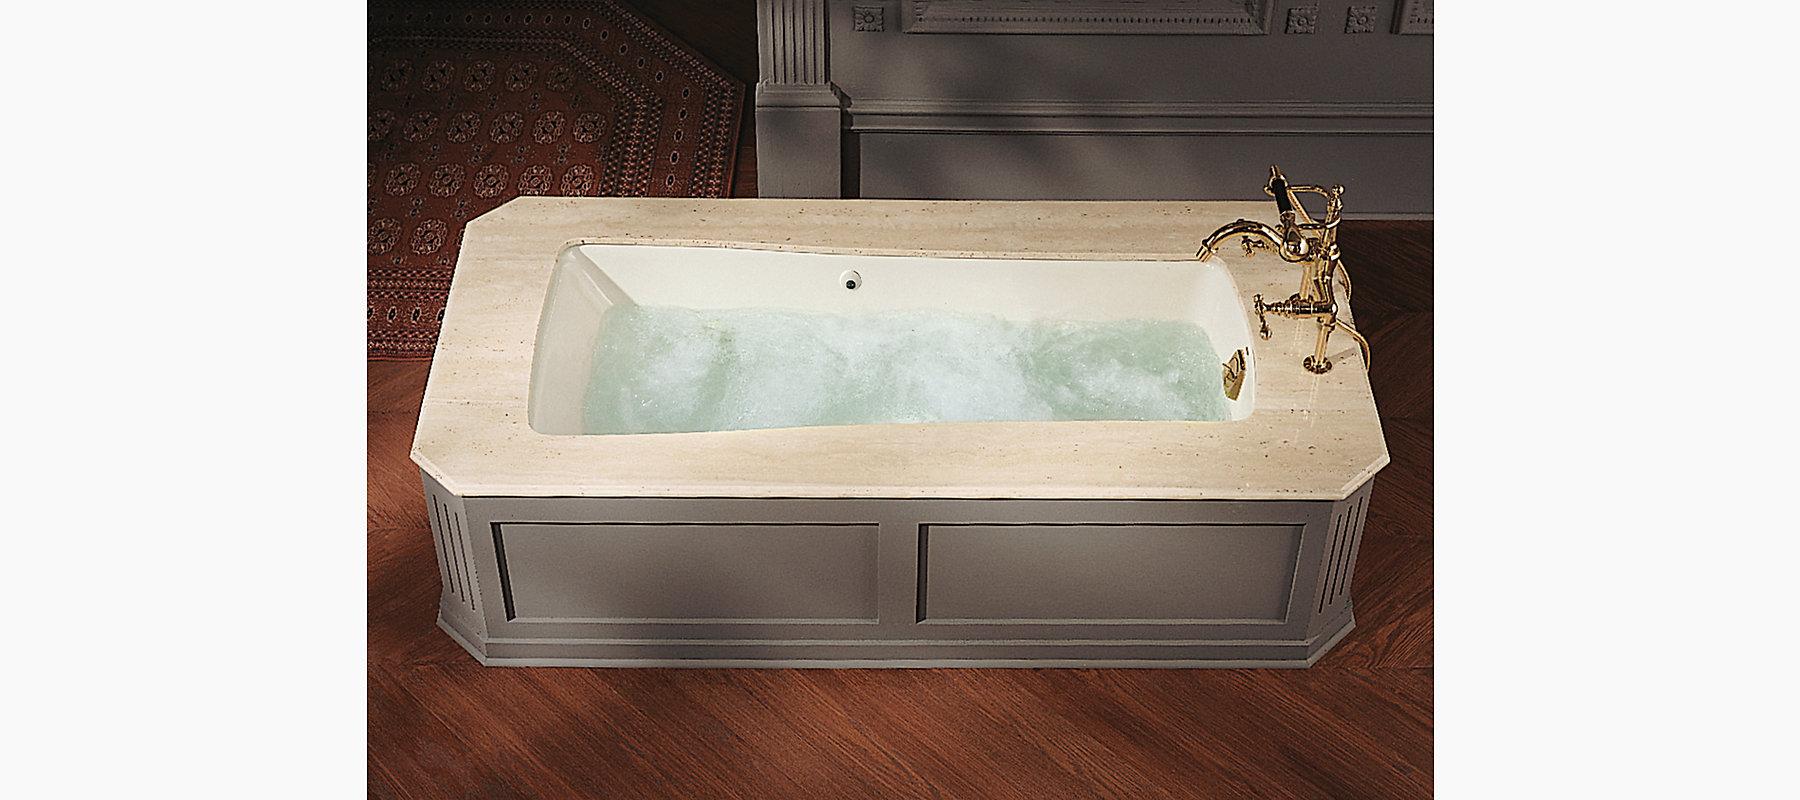 Maestro 5.5-Foot Whirlpool Bath | K-845-H2 | KOHLER